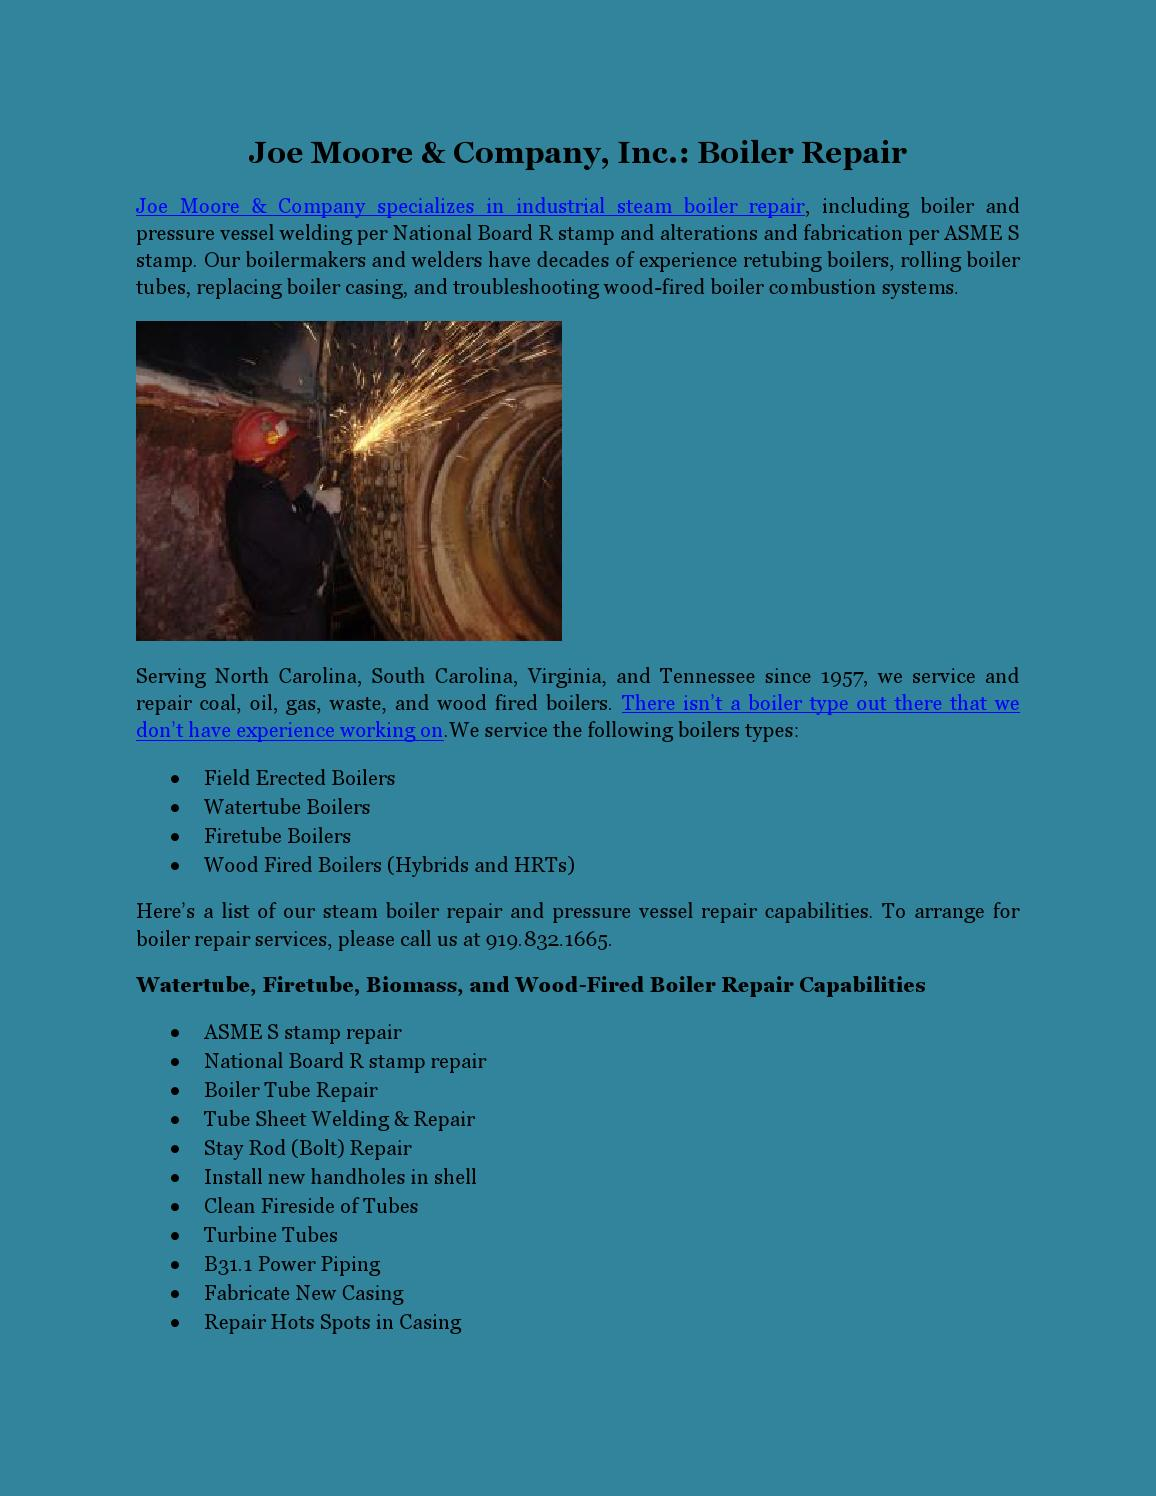 Joe Moore & Company Inc.: Boiler Repair by Dawn Hertz - issuu